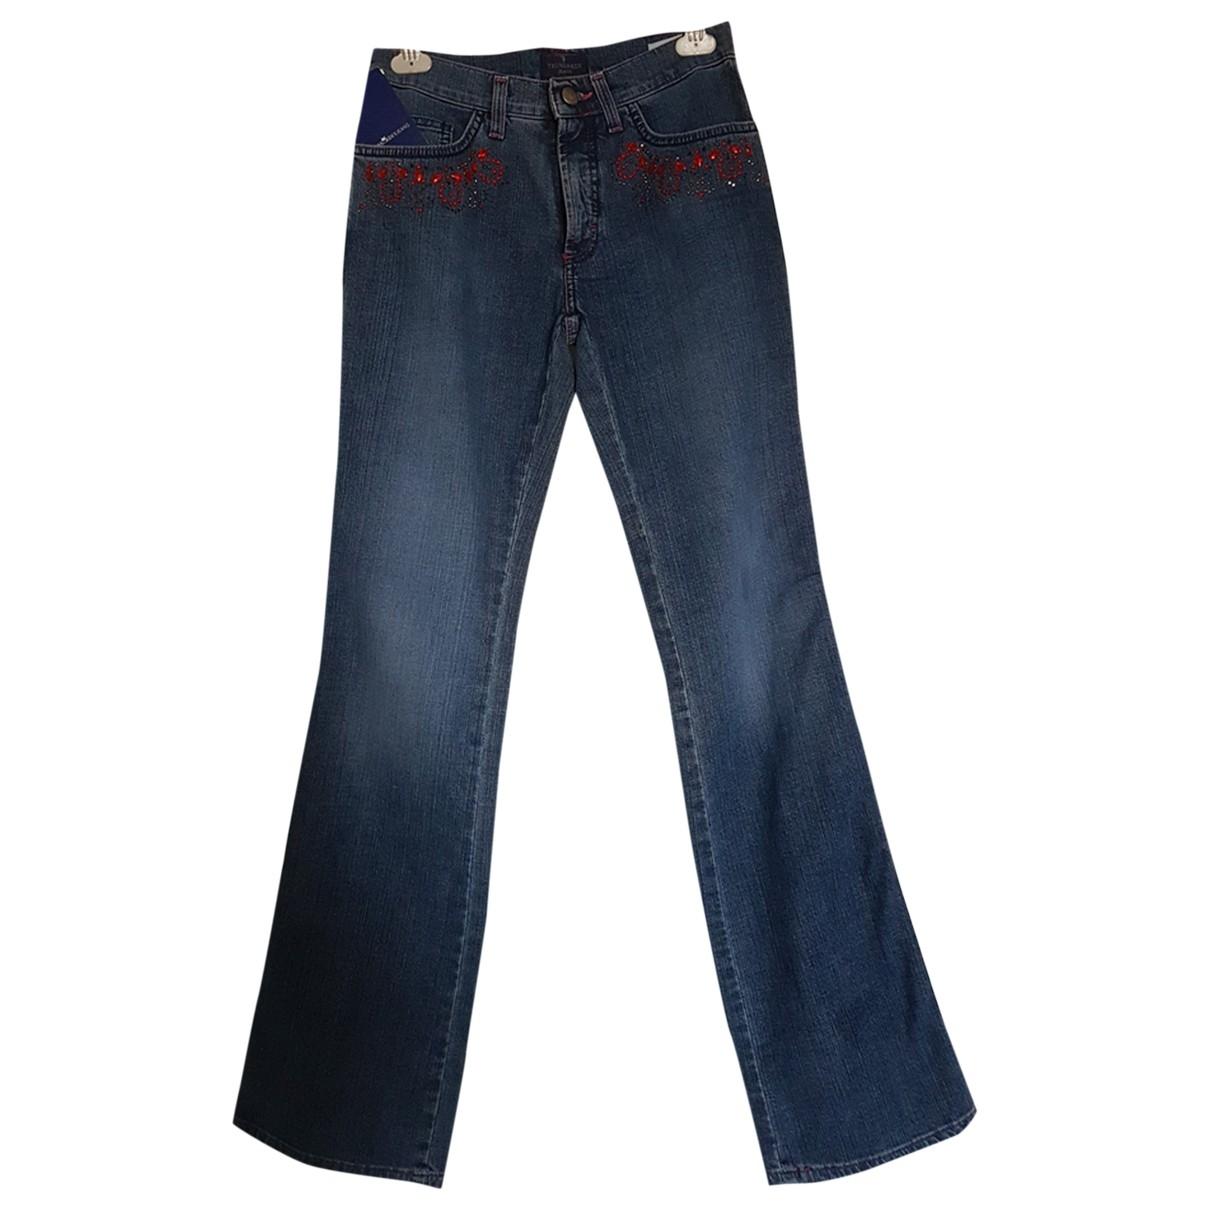 Trussardi Jeans \N Blue Cotton - elasthane Jeans for Women 27 US